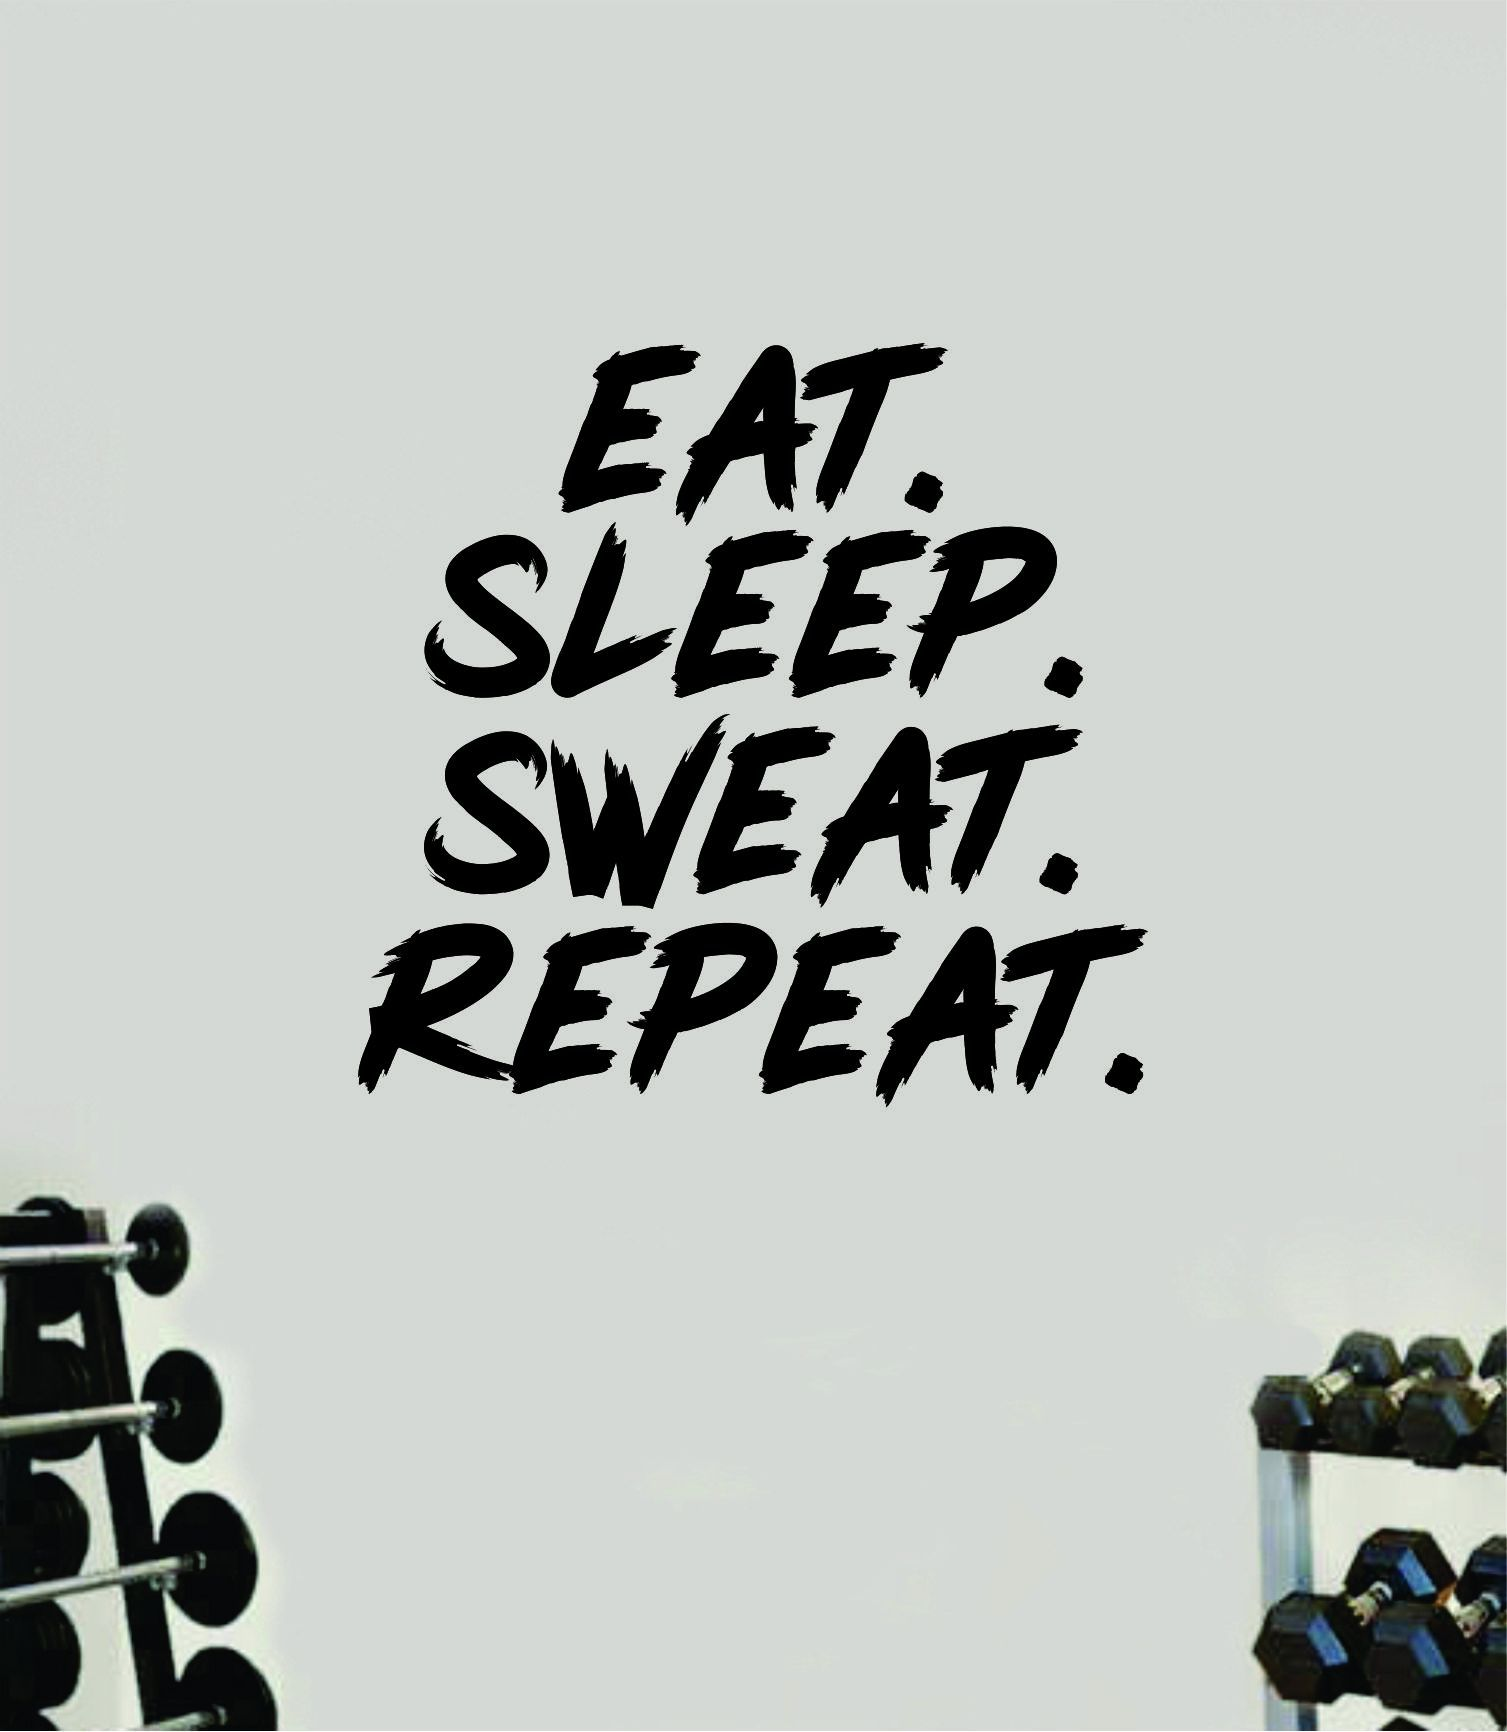 Eat Sleep Sweat Repeat Decal Sticker Wall Vinyl Art Wall Bedroom Room Decor Motivational Inspirational Teen Sports Gym Fitness Lift Health - orange